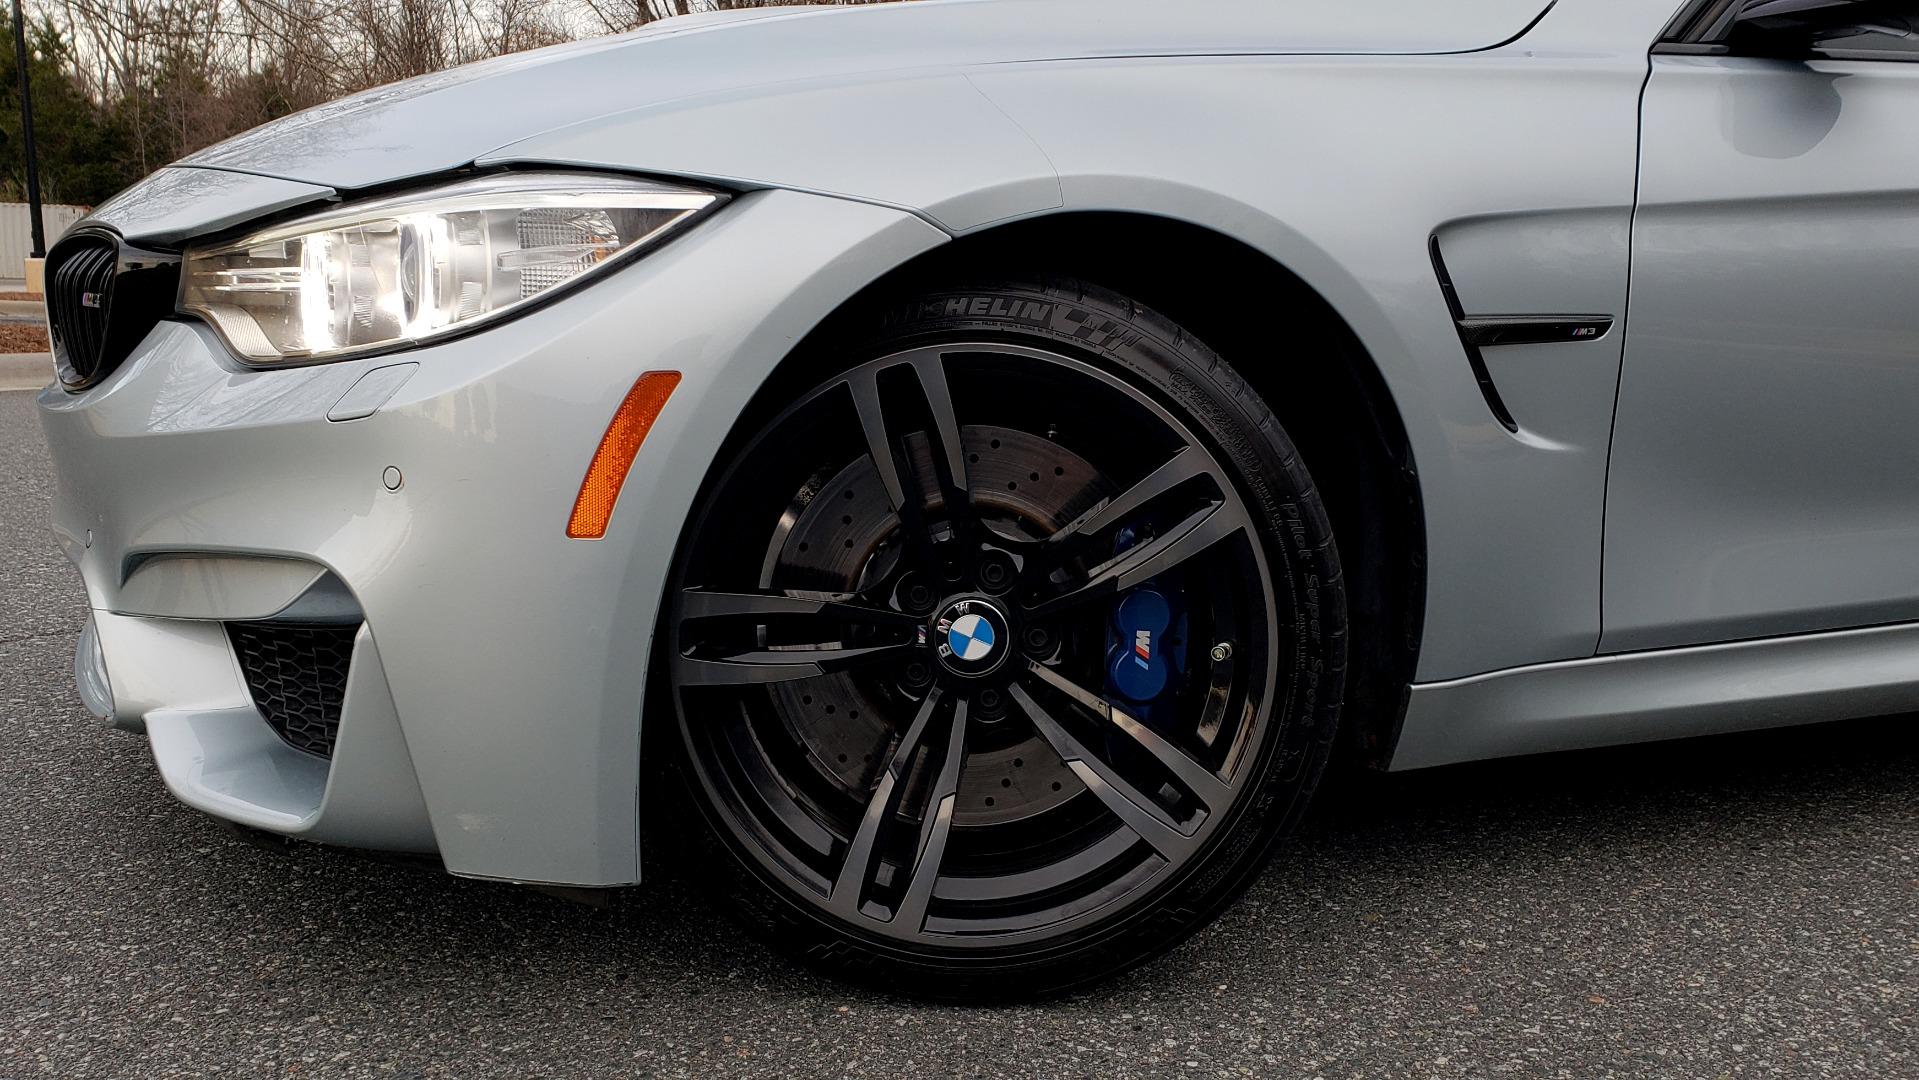 Used 2015 BMW M3 EXECUTIVE PKG / NAV / CAMERA / HUD / CARBON FIBER ROOF for sale Sold at Formula Imports in Charlotte NC 28227 21